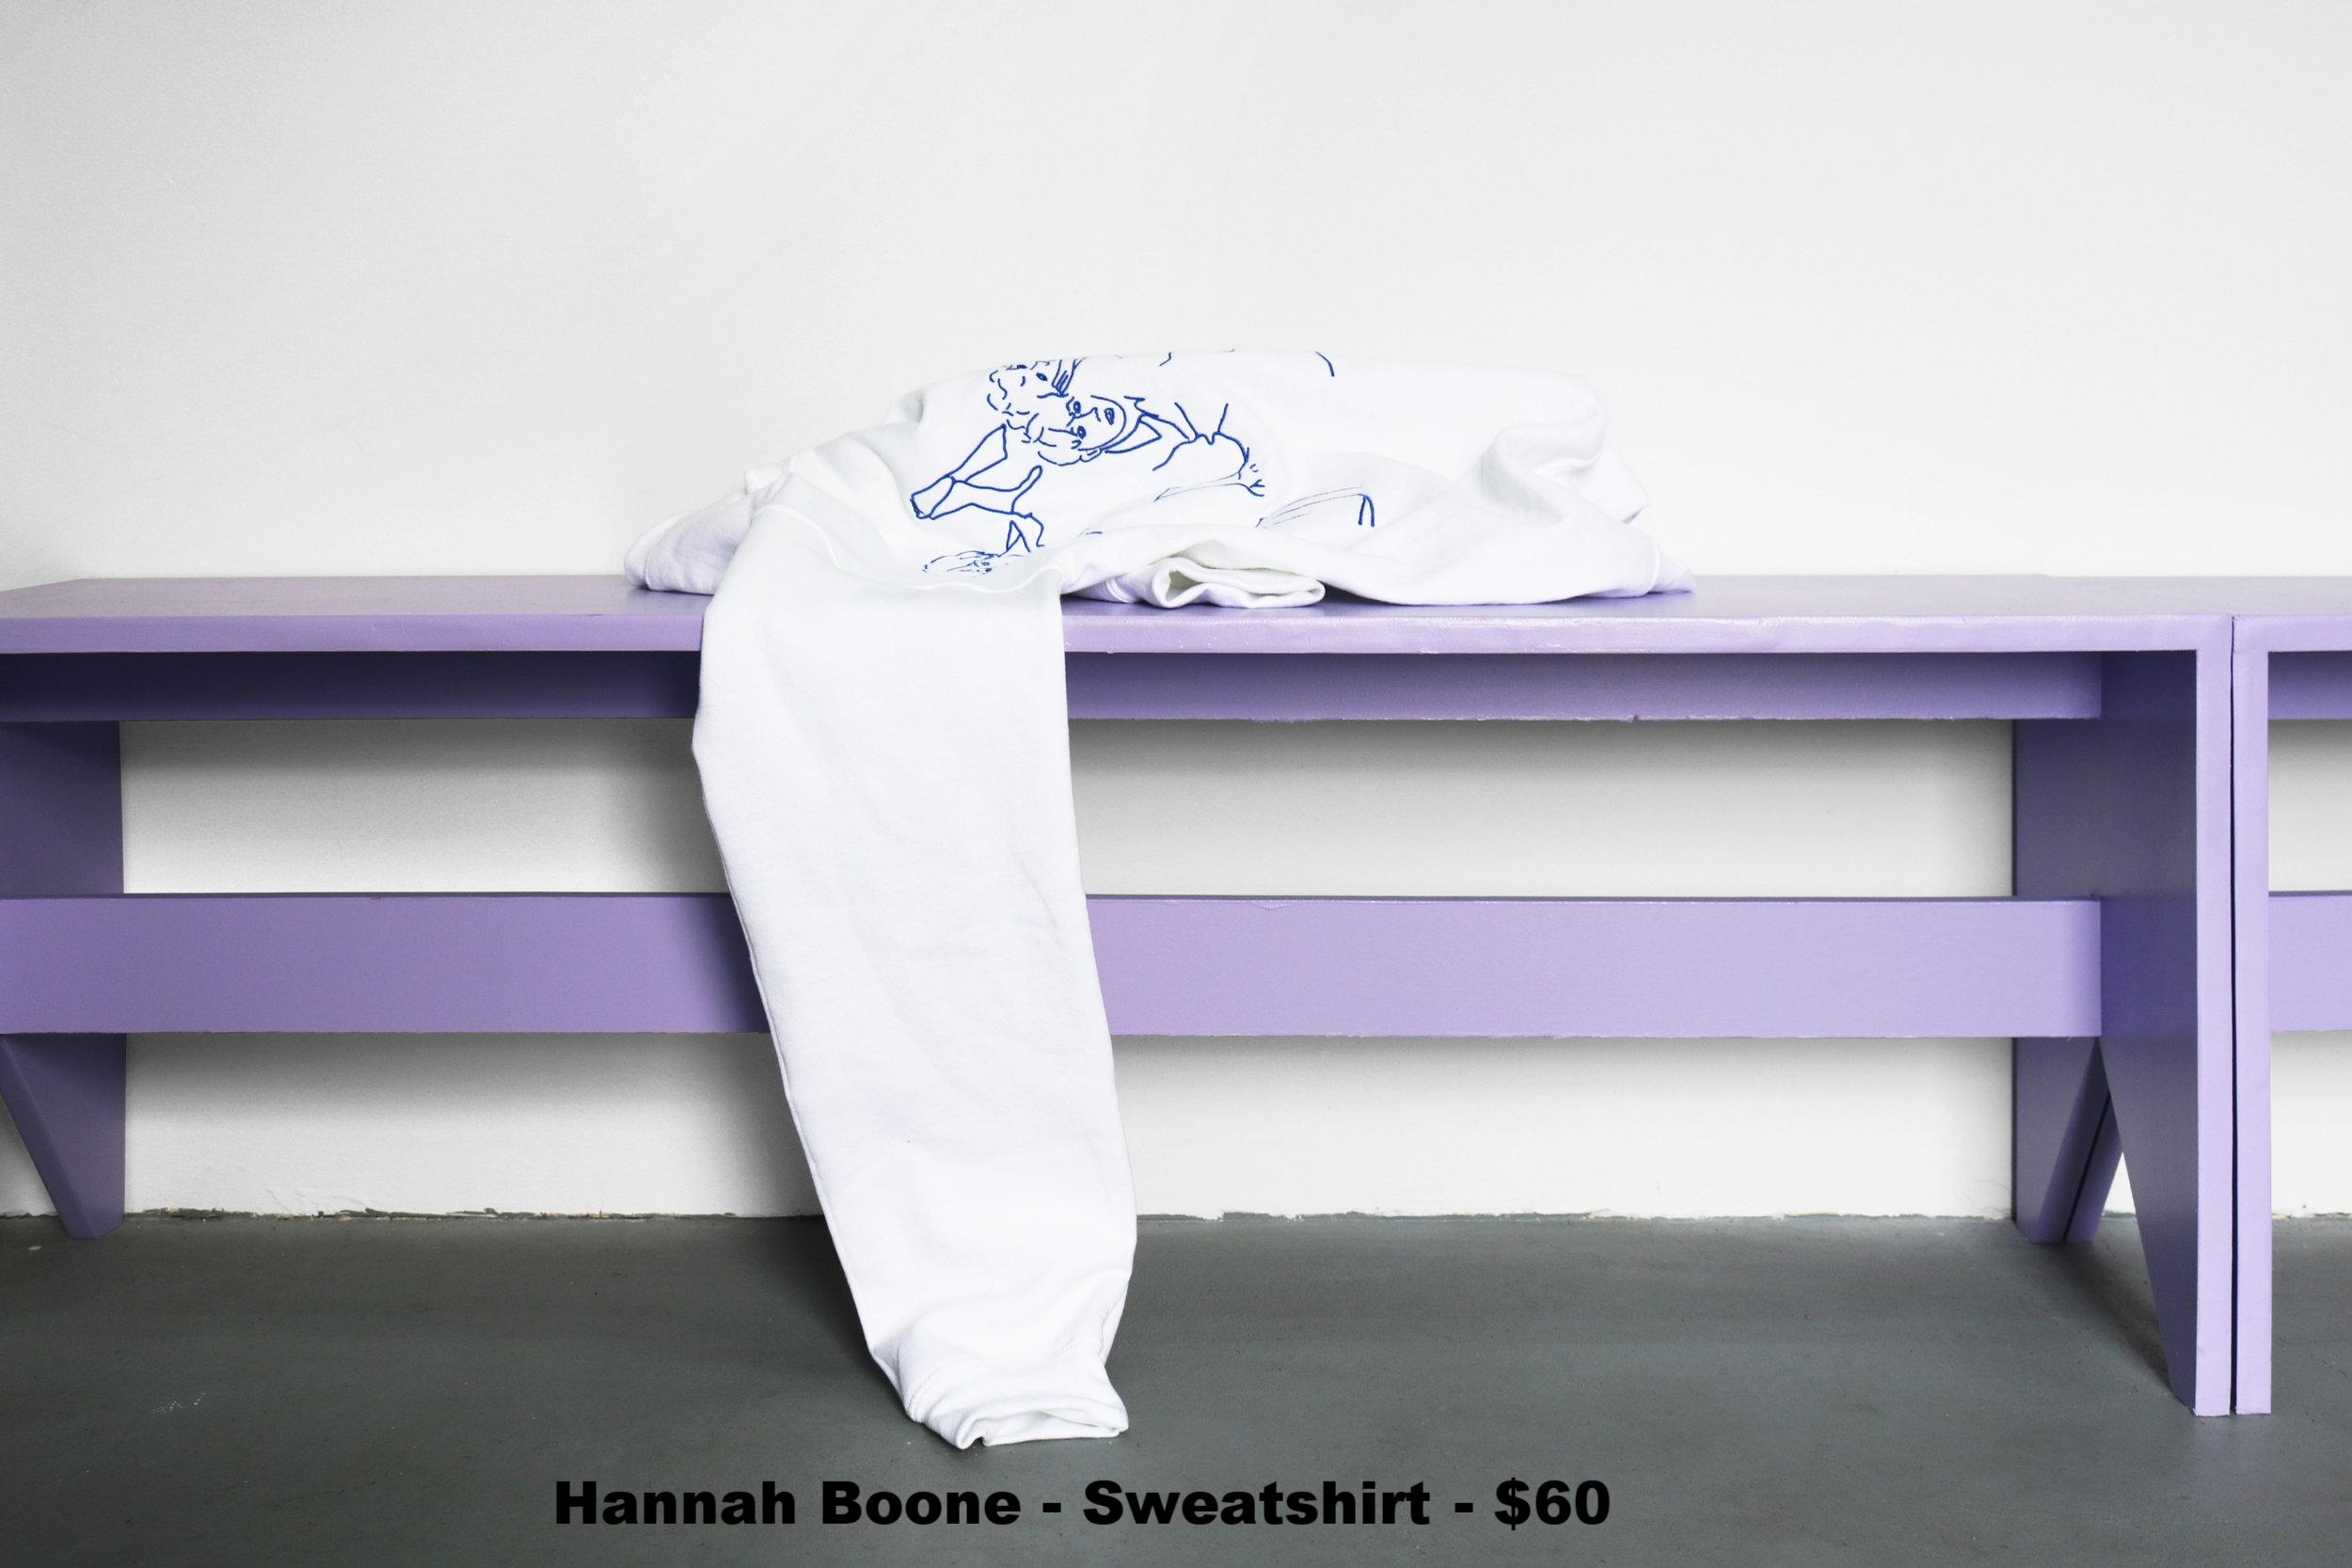 Hannah Boone_Rogers Office_HB-Install-Shot-2_2_5000.jpg